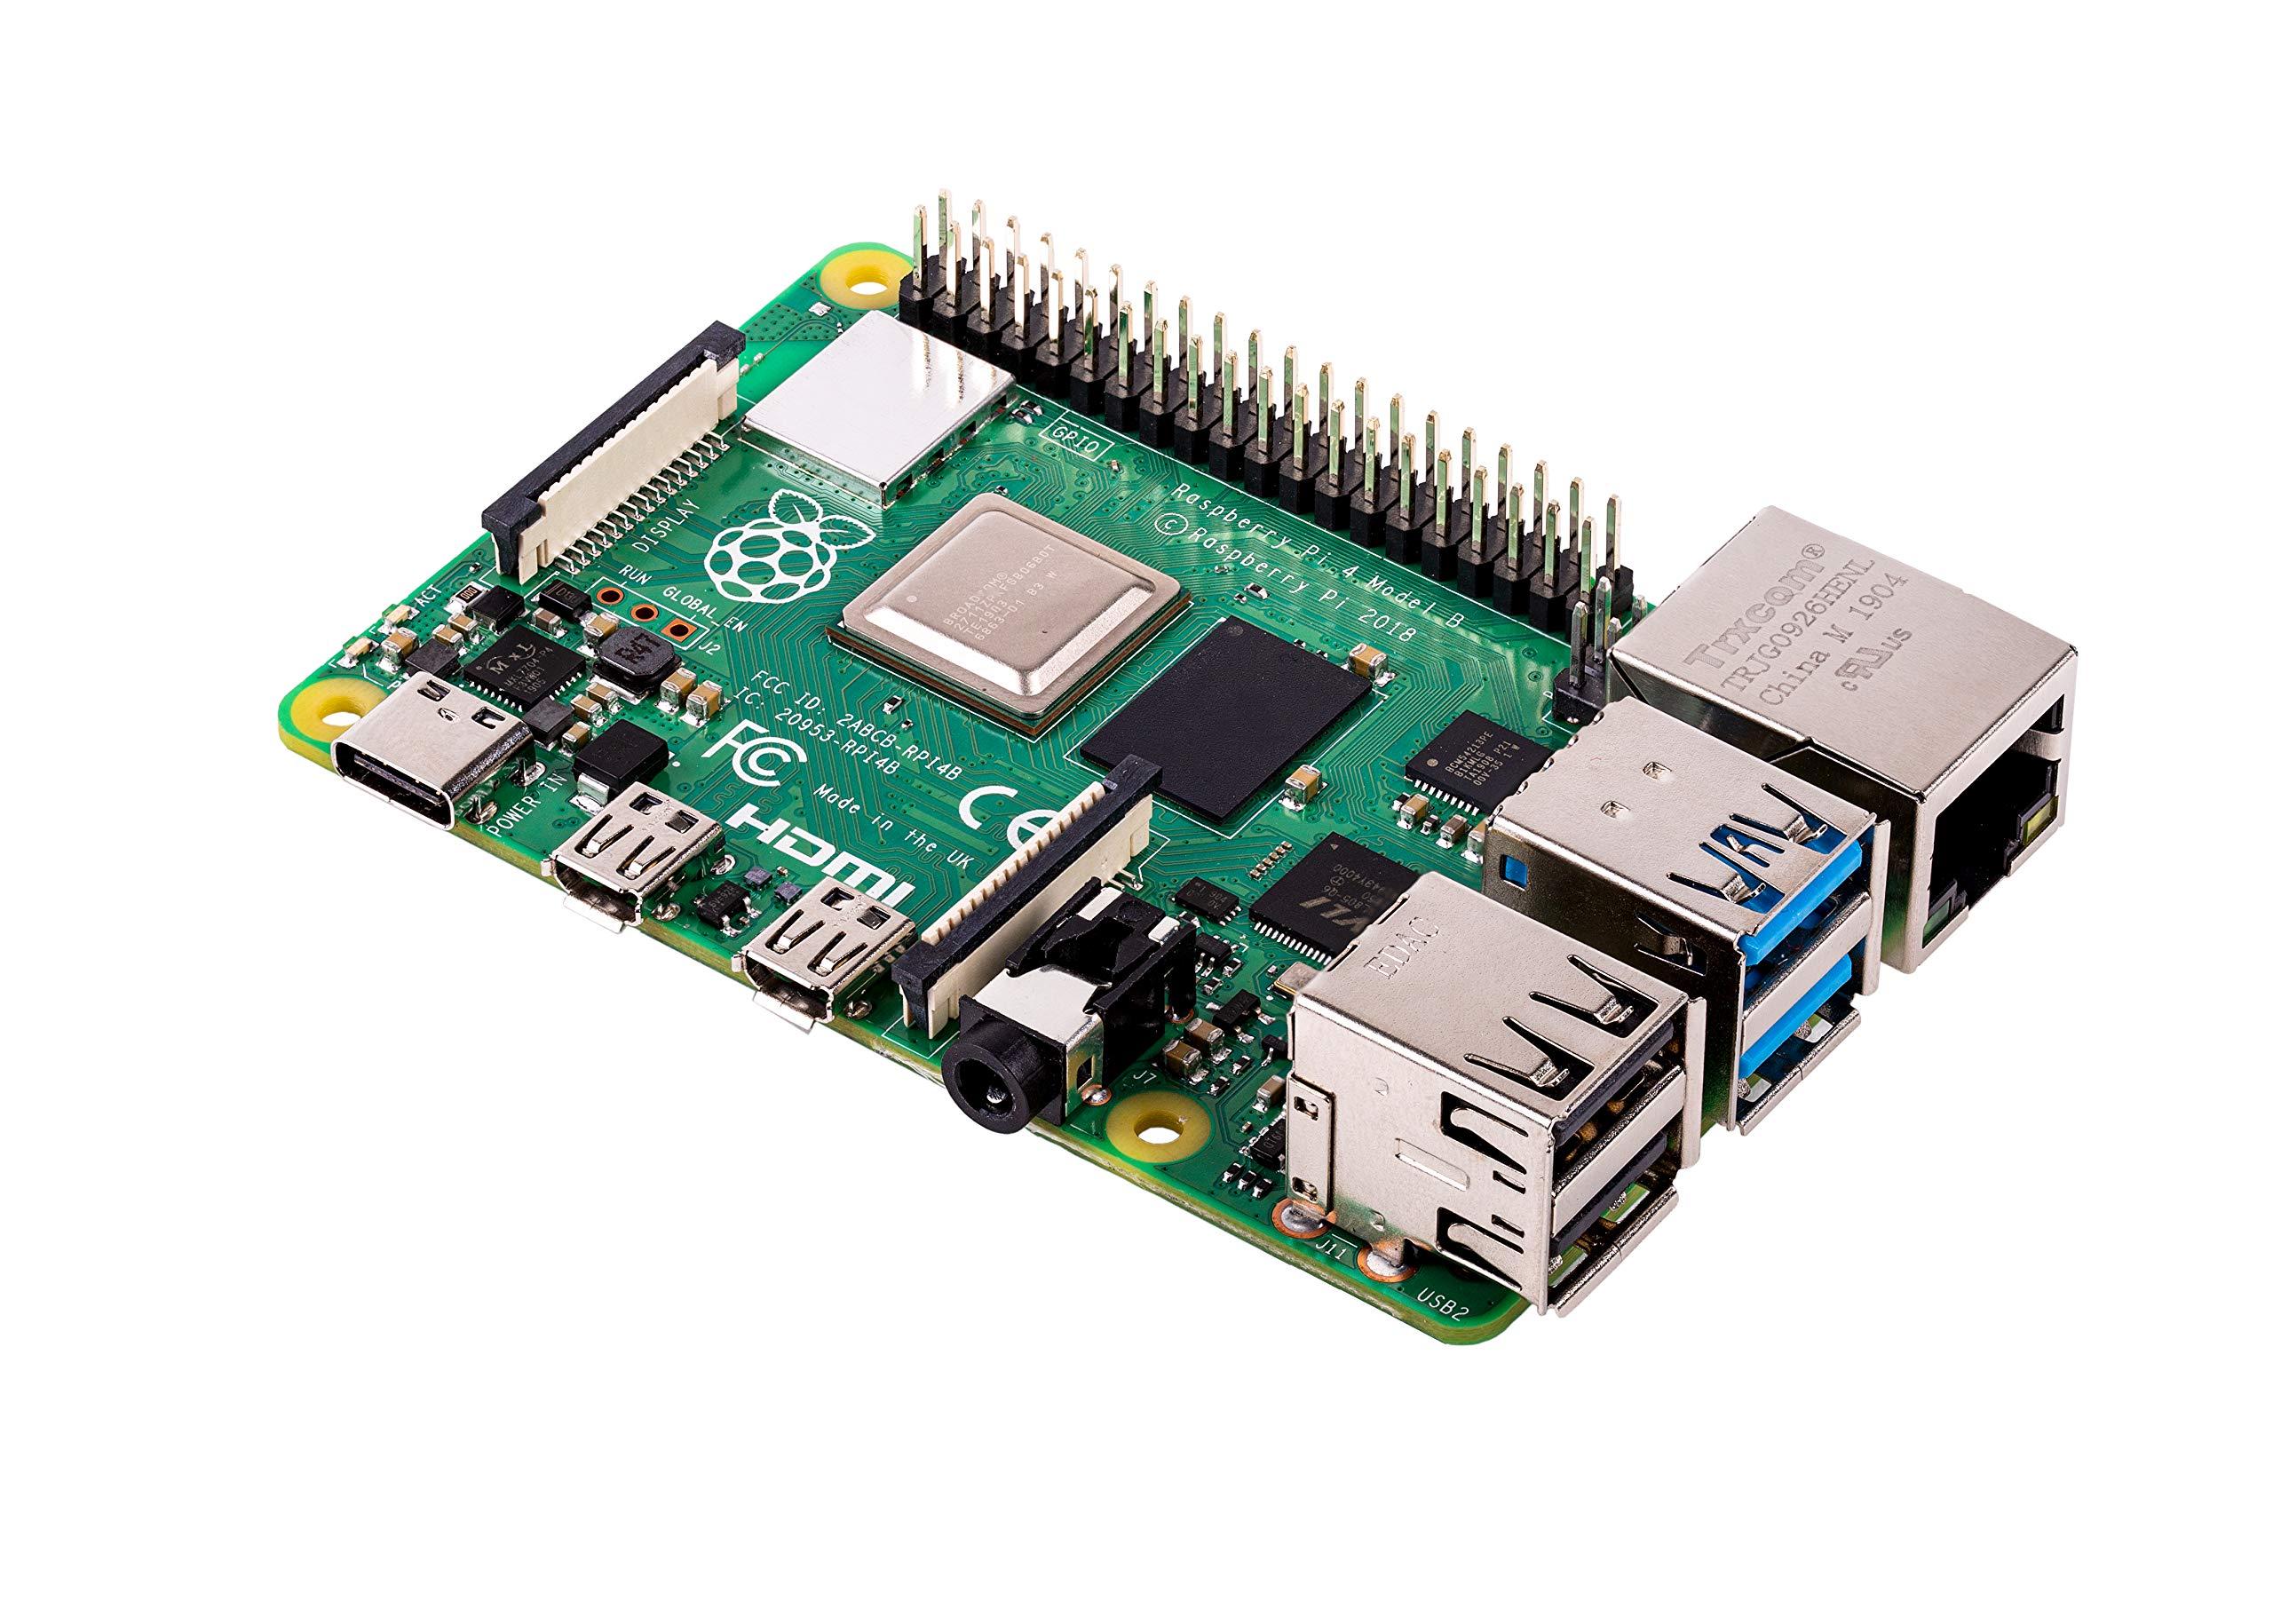 Raspberry Pi 4 Model B 2019 Quad Core 64 Bit WiFi Bluetooth (4GB) by Raspberry